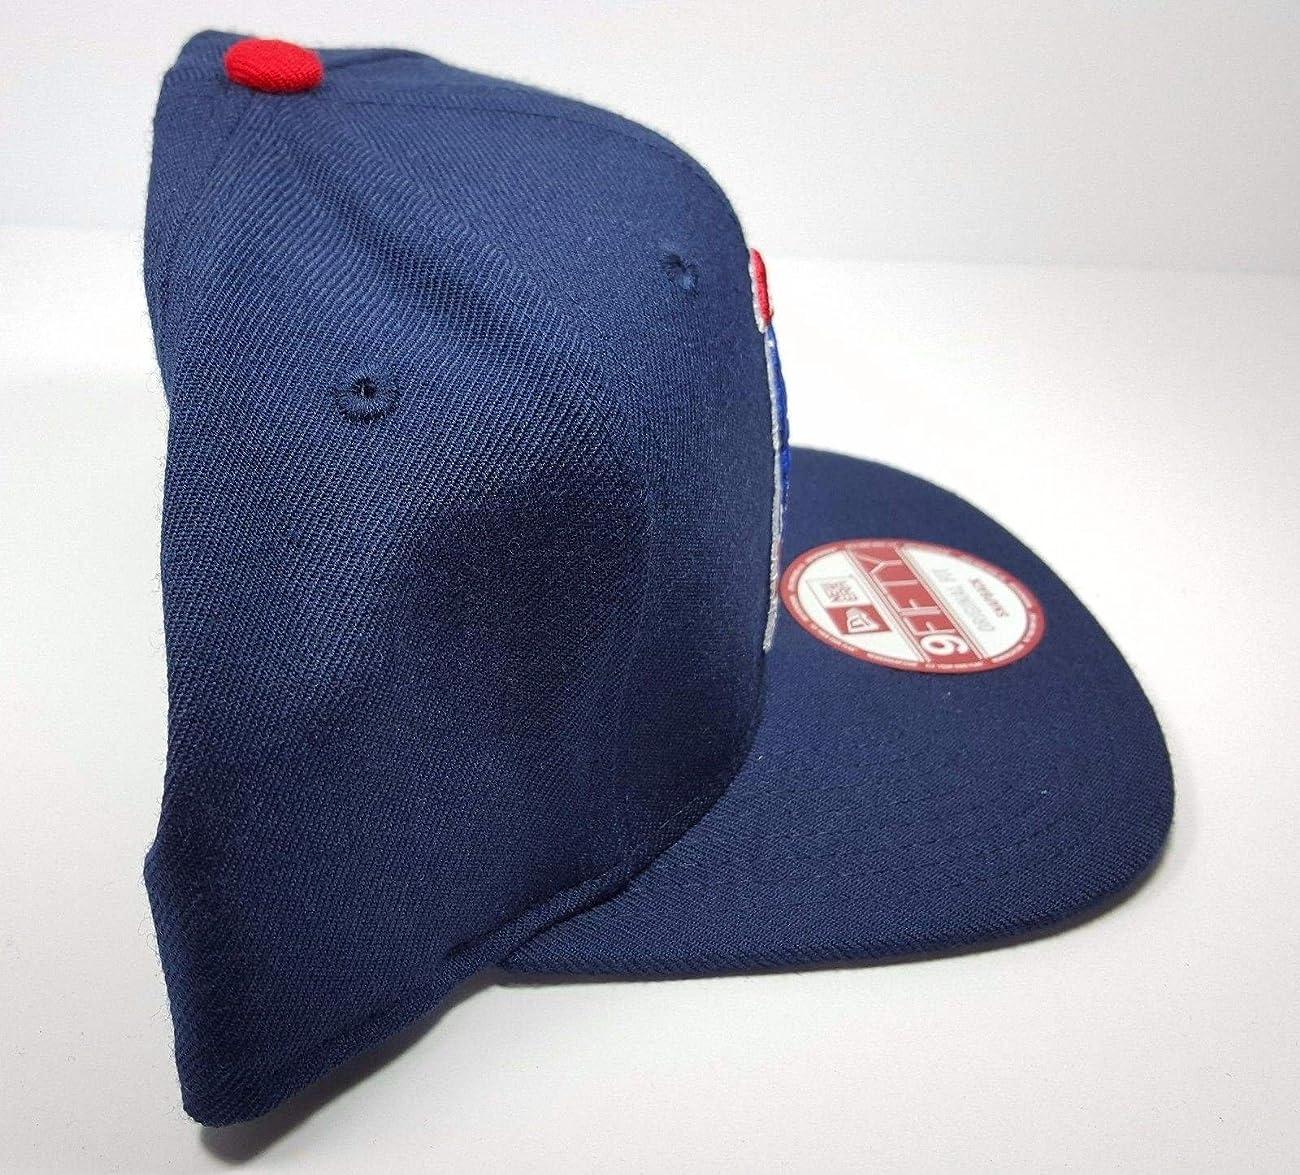 New Era New England Patriots 9Fifty Vintage Throwback Navy Blue Logo Adjustable Snapback Hat NFL 2